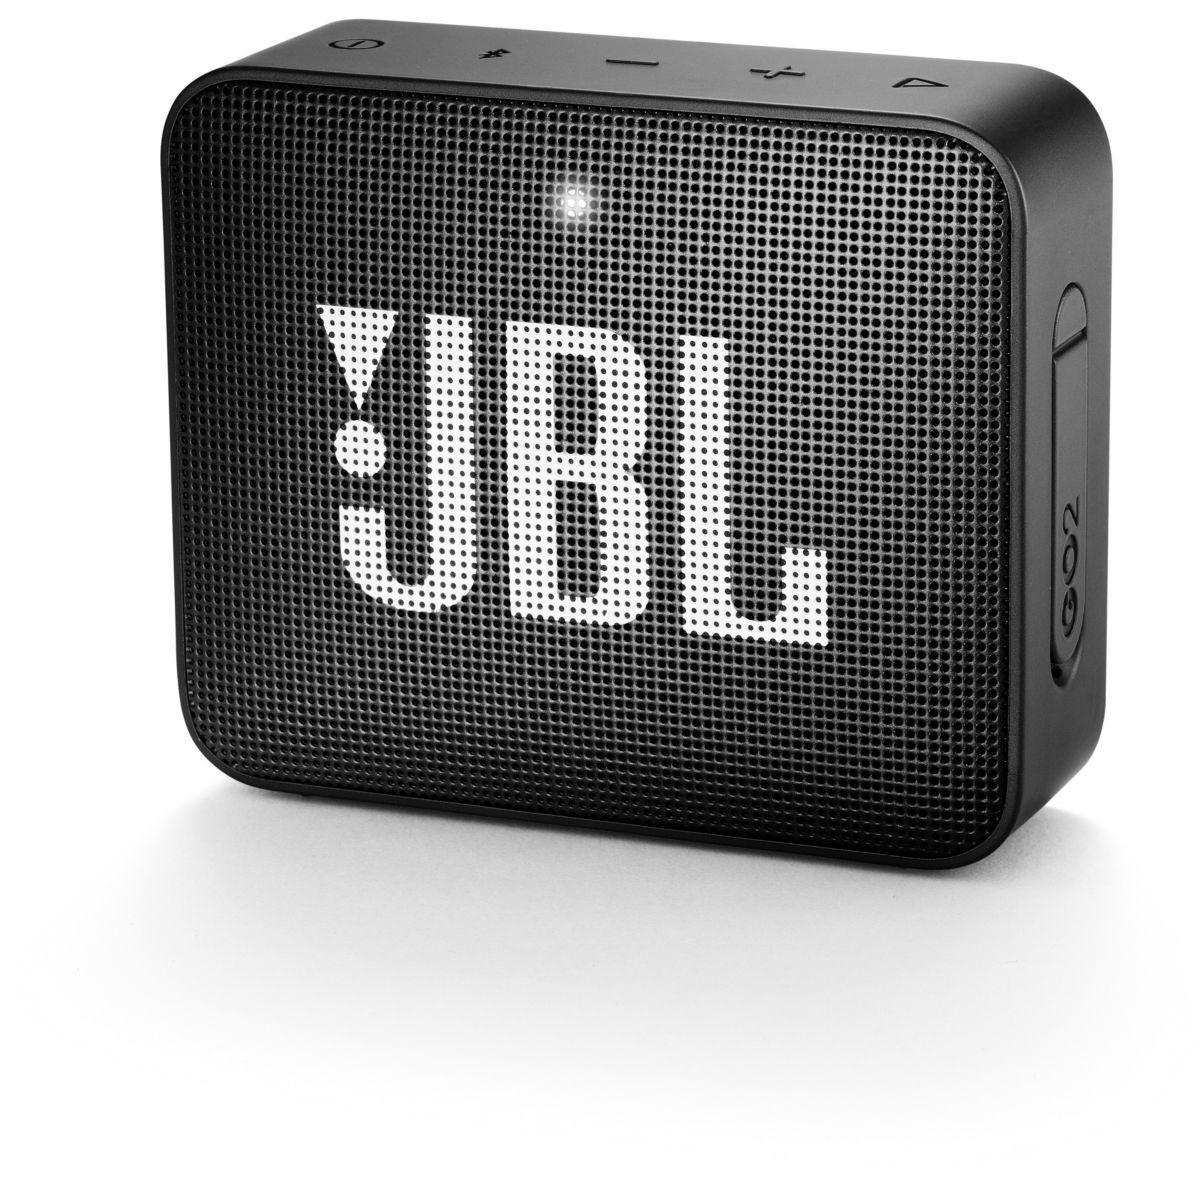 Enceinte bluetooth jbl go 2 noir (photo)